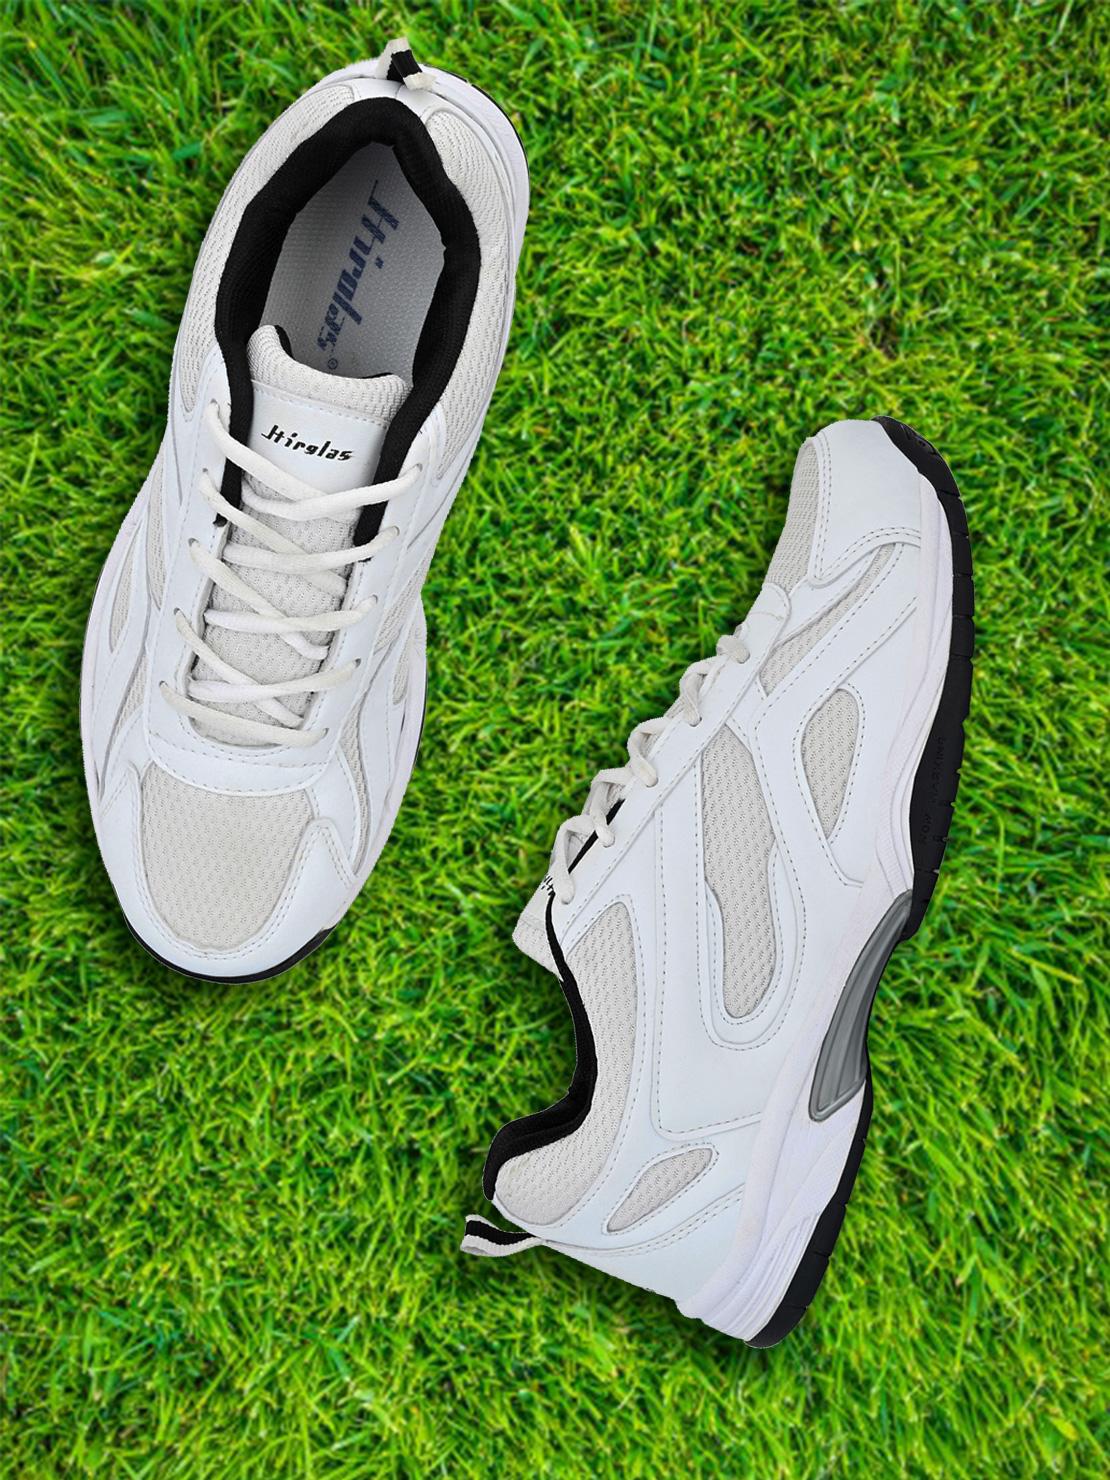 Hirolas   Hirolas® Multi Sport Shock Absorbing Walking  Running Fitness Athletic Training Gym Sneaker Shoes - White